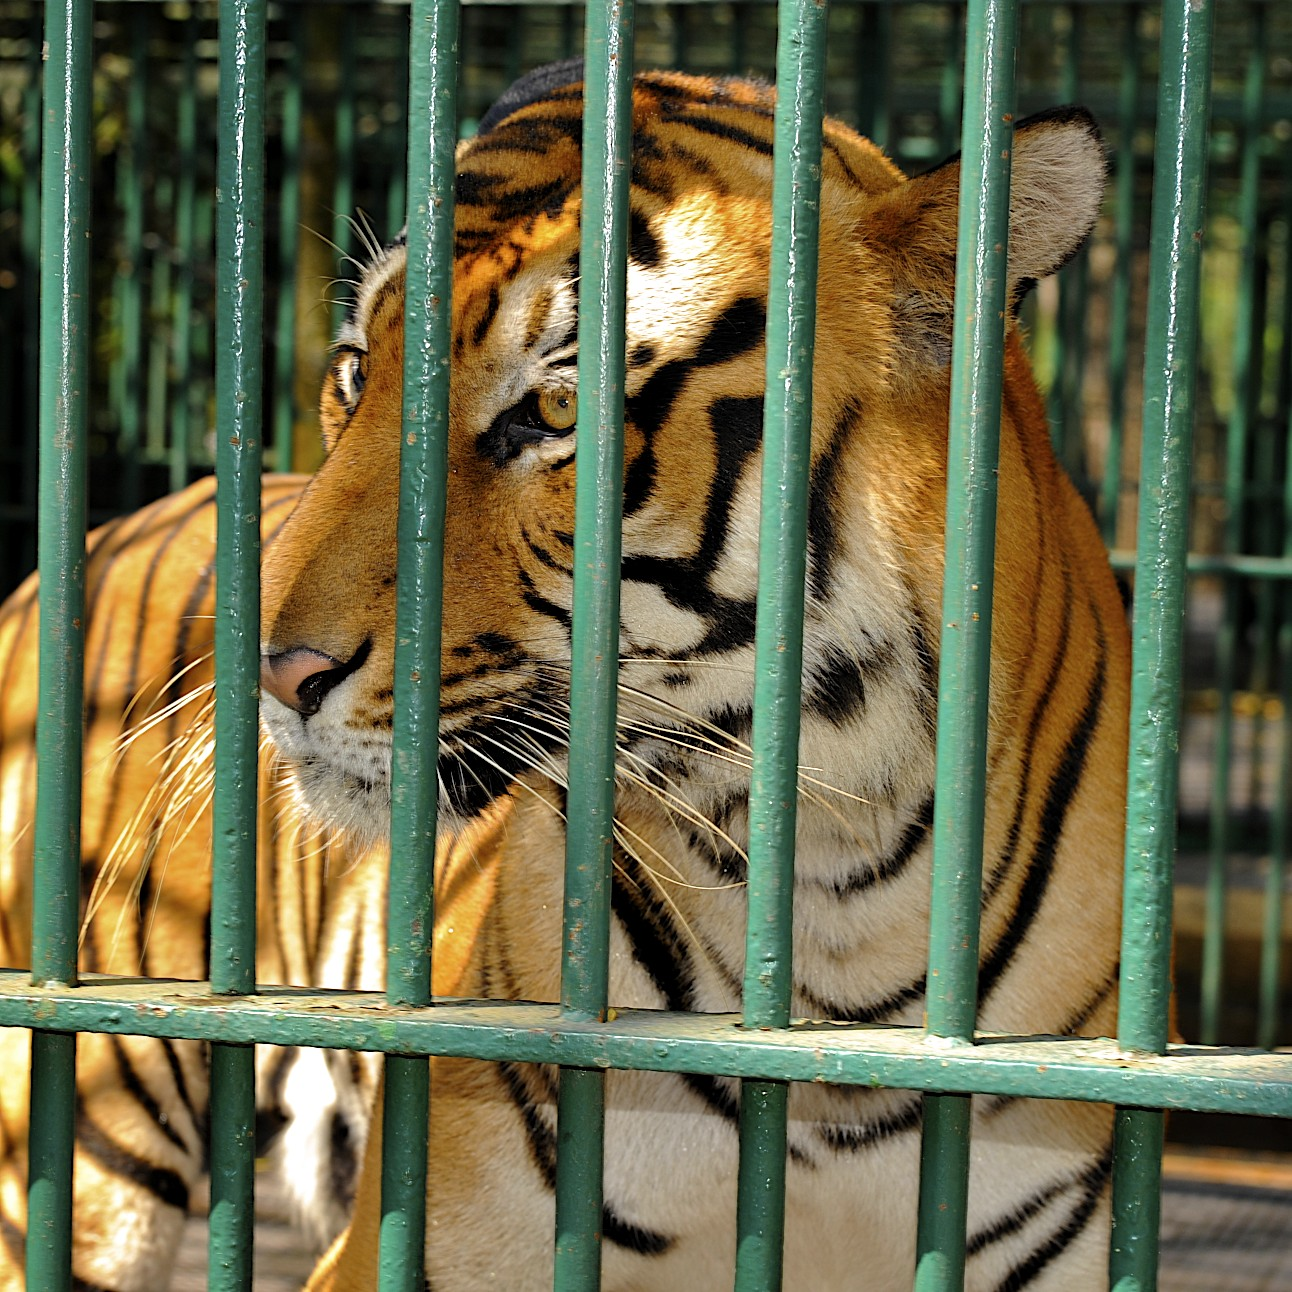 zoo essay in sanskrit